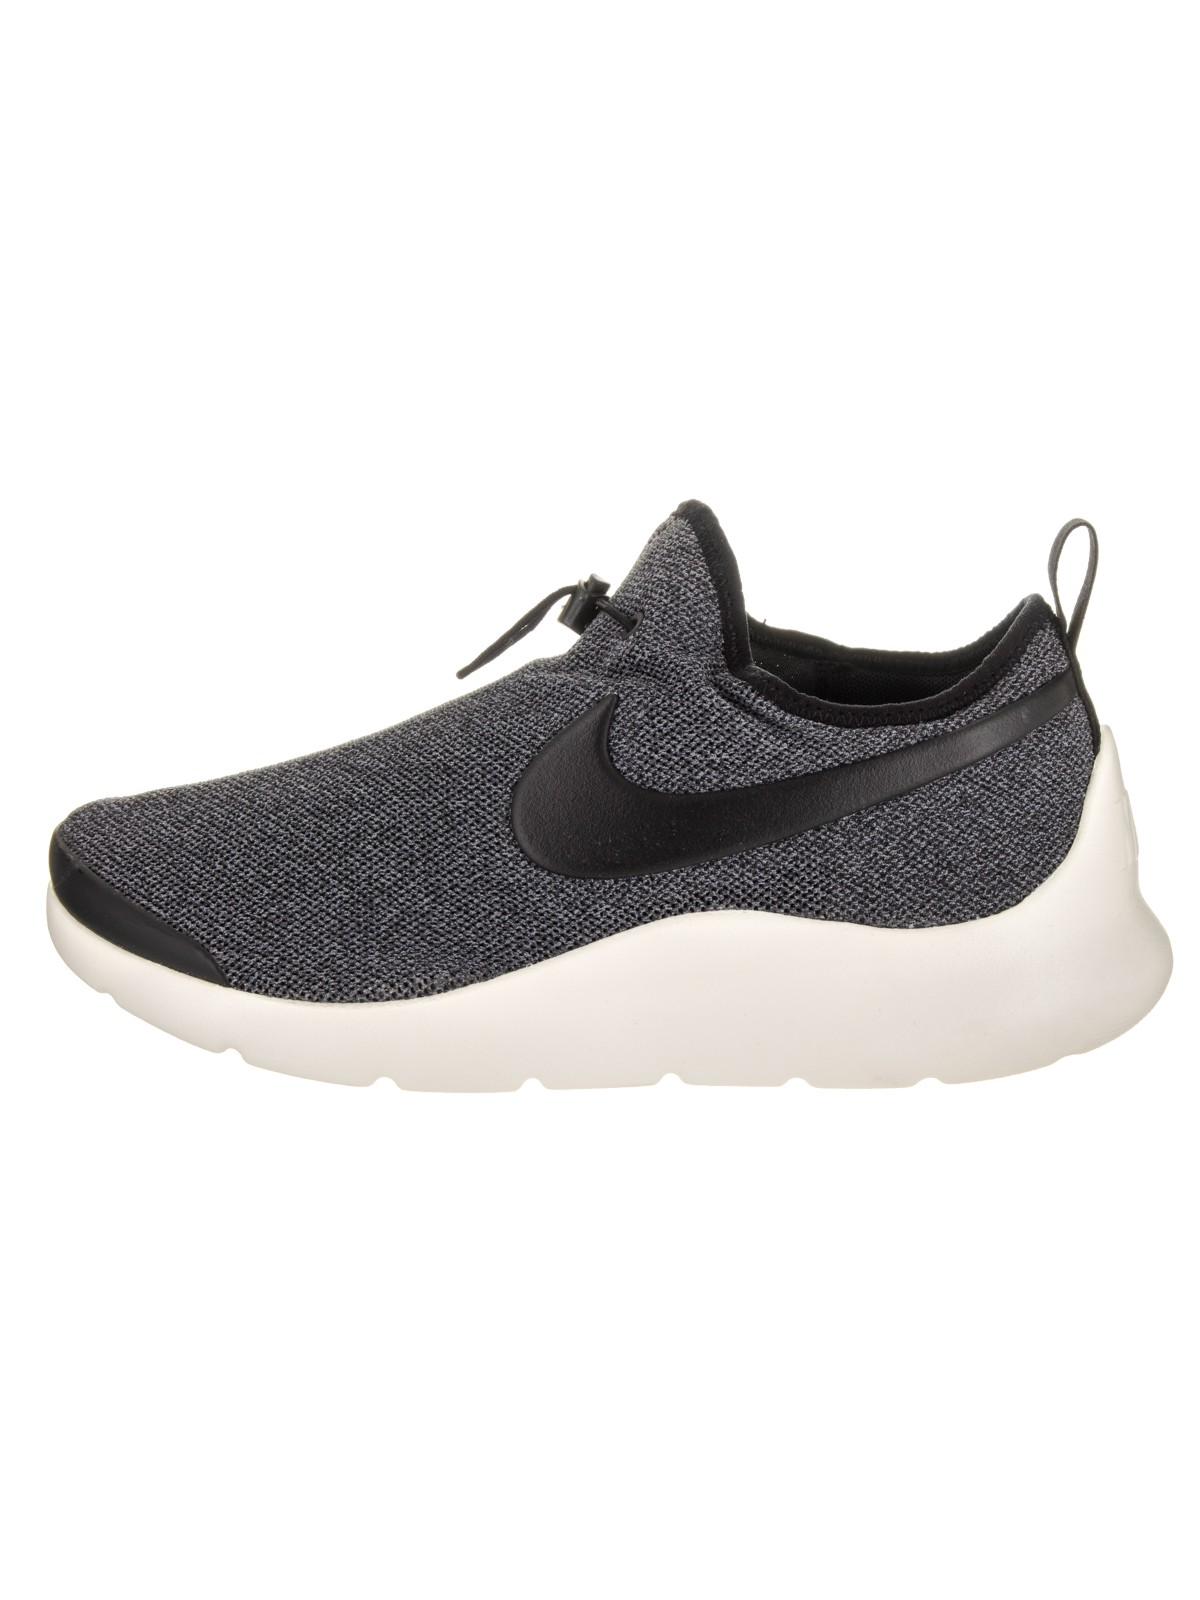 Nike Men's Aptare SE Running Shoe